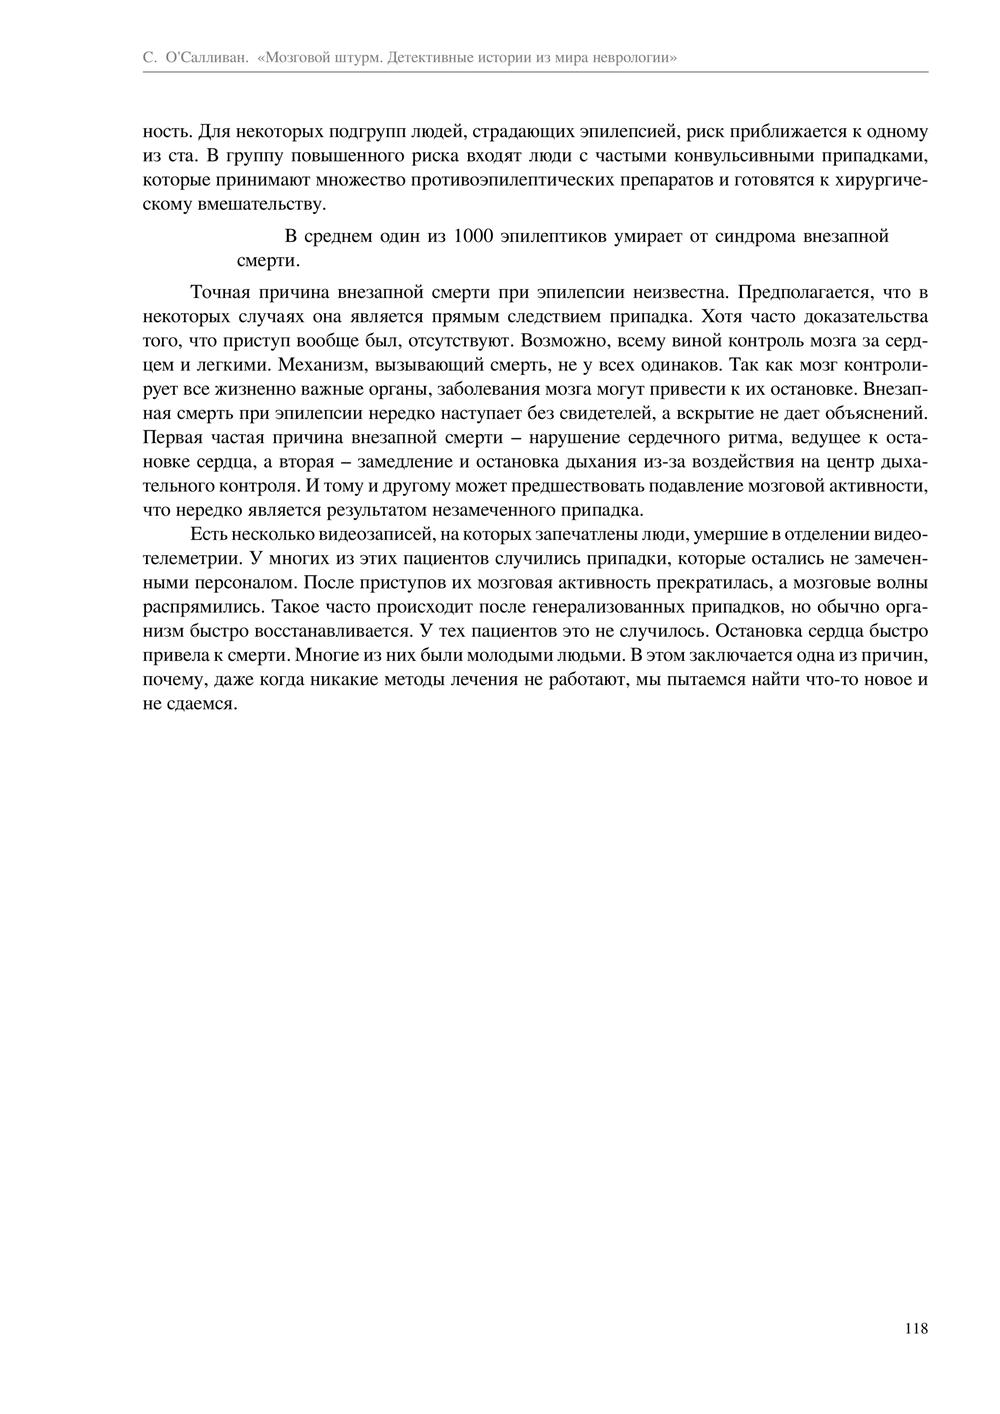 http://ipic.su/img/img7/fs/O_sallivan_S.1597482893.jpg